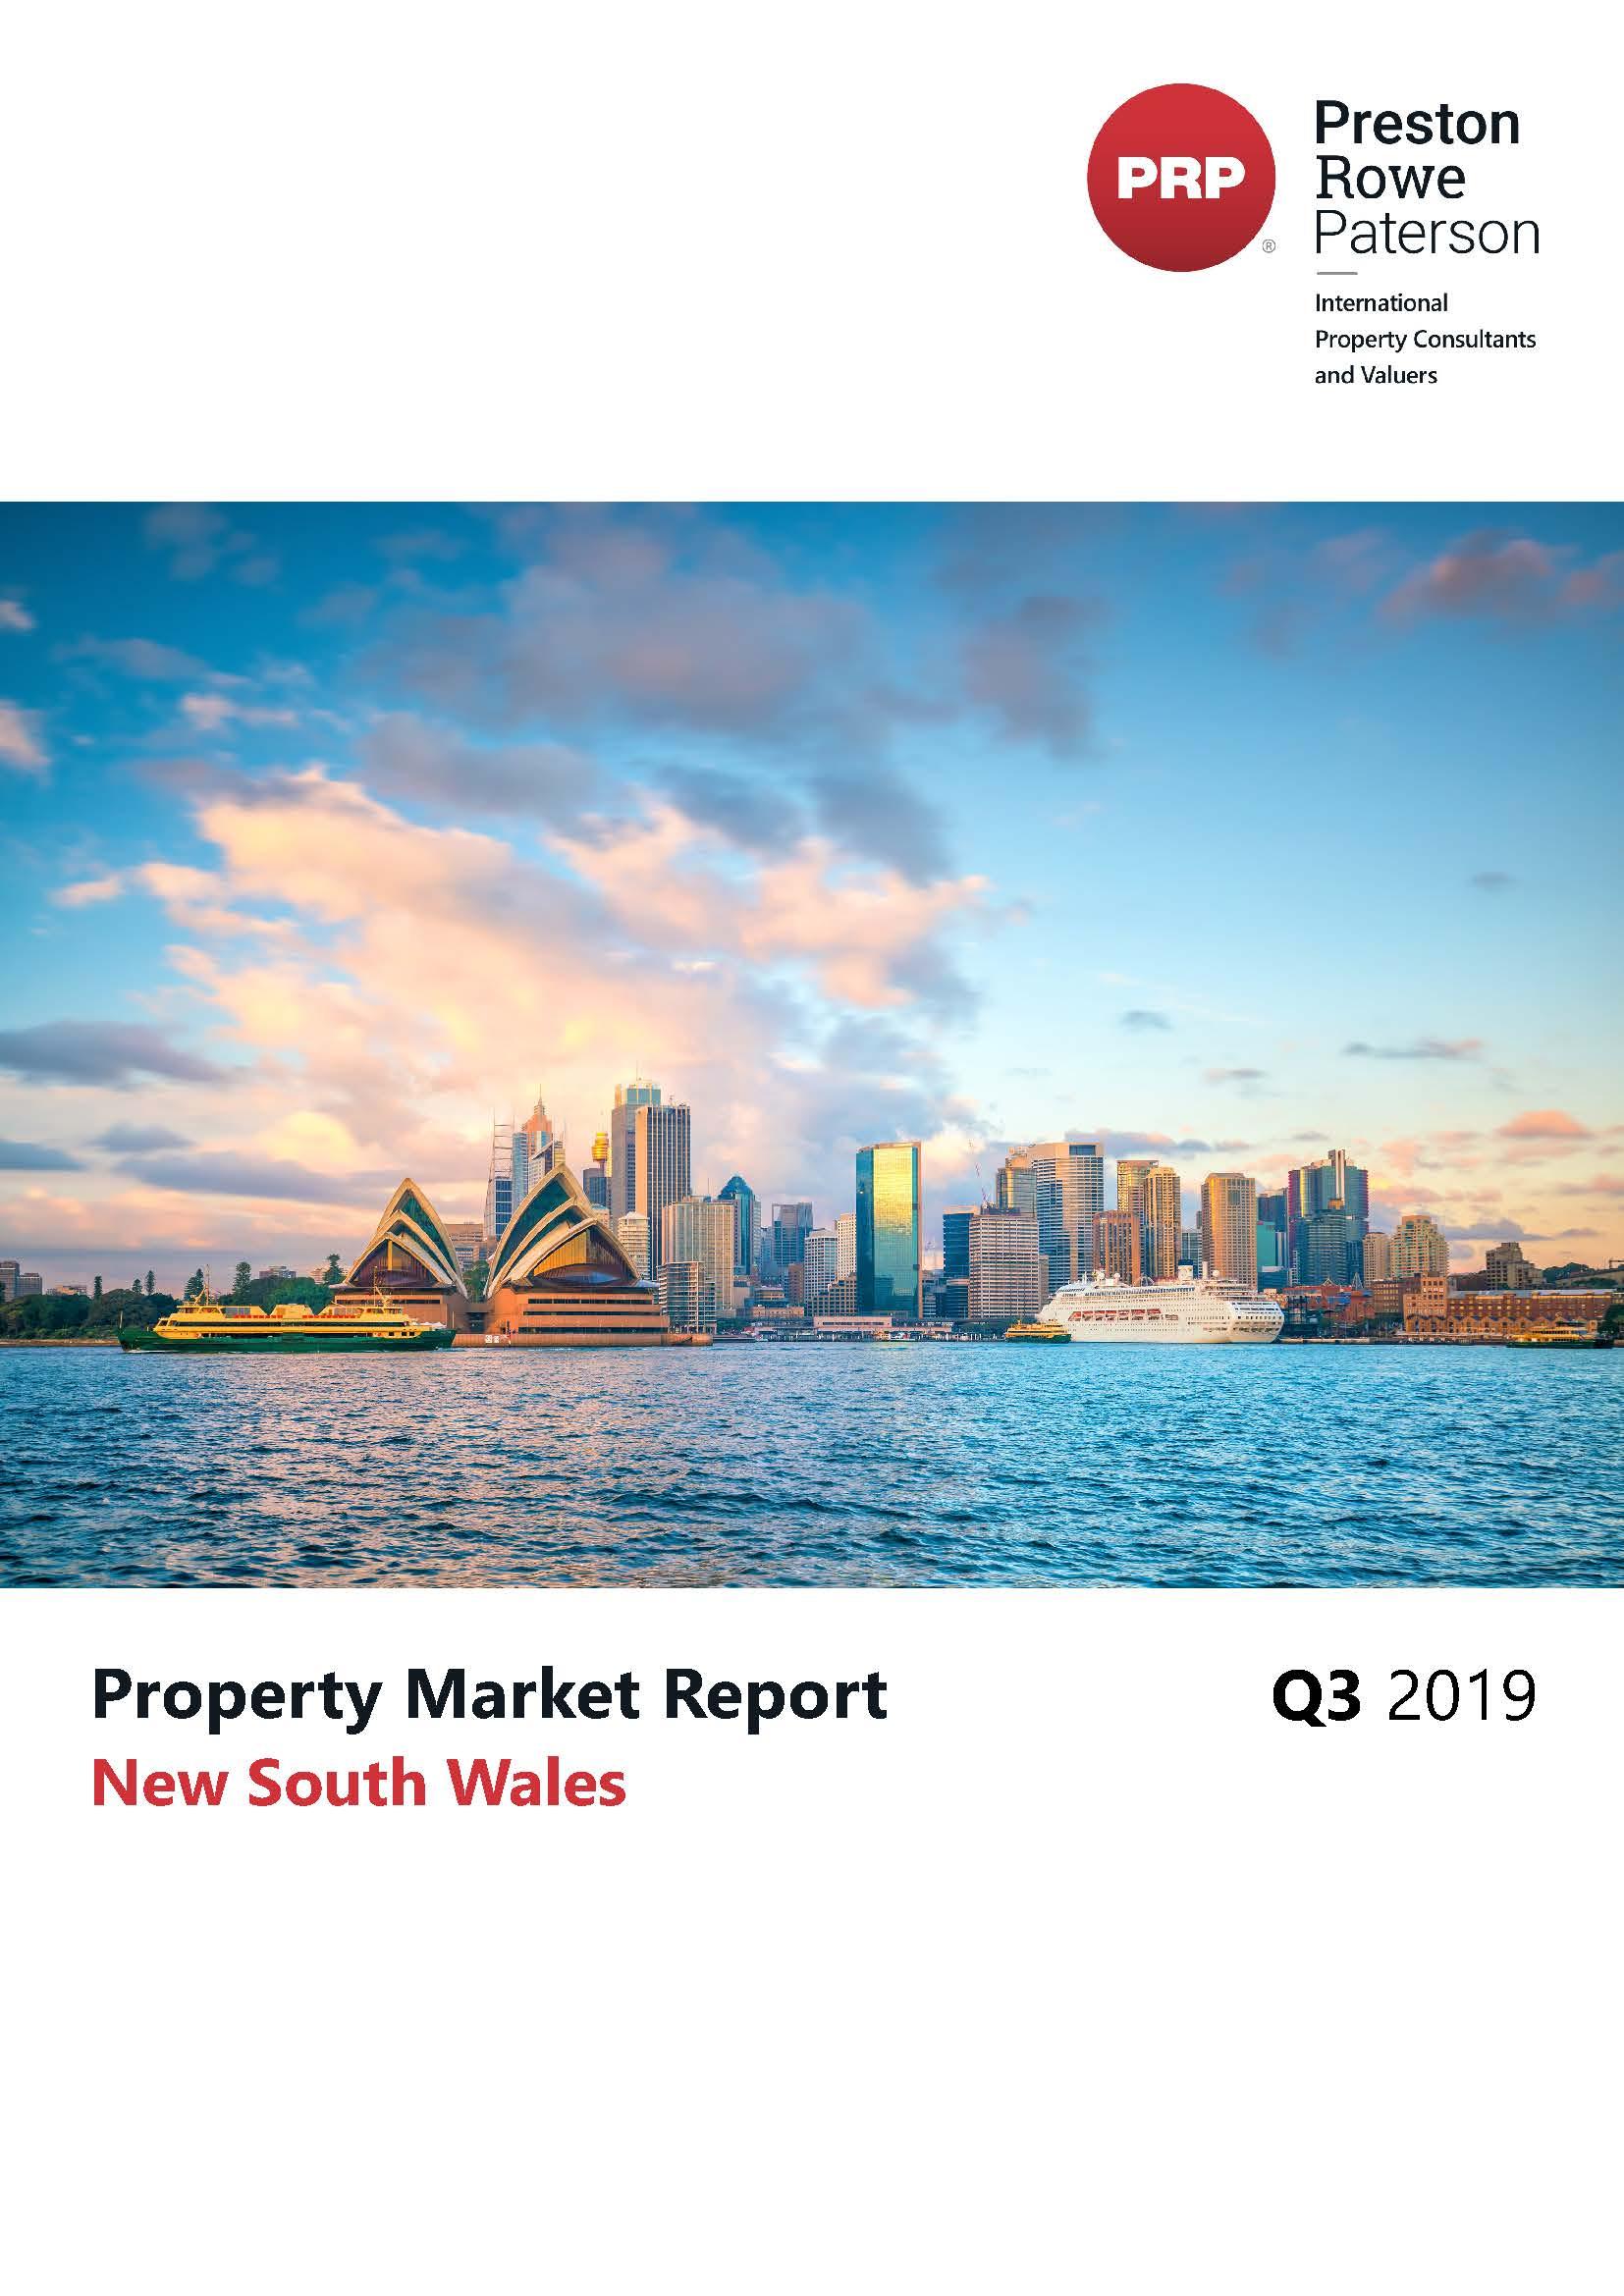 NSW Property Market Report Q3 2019